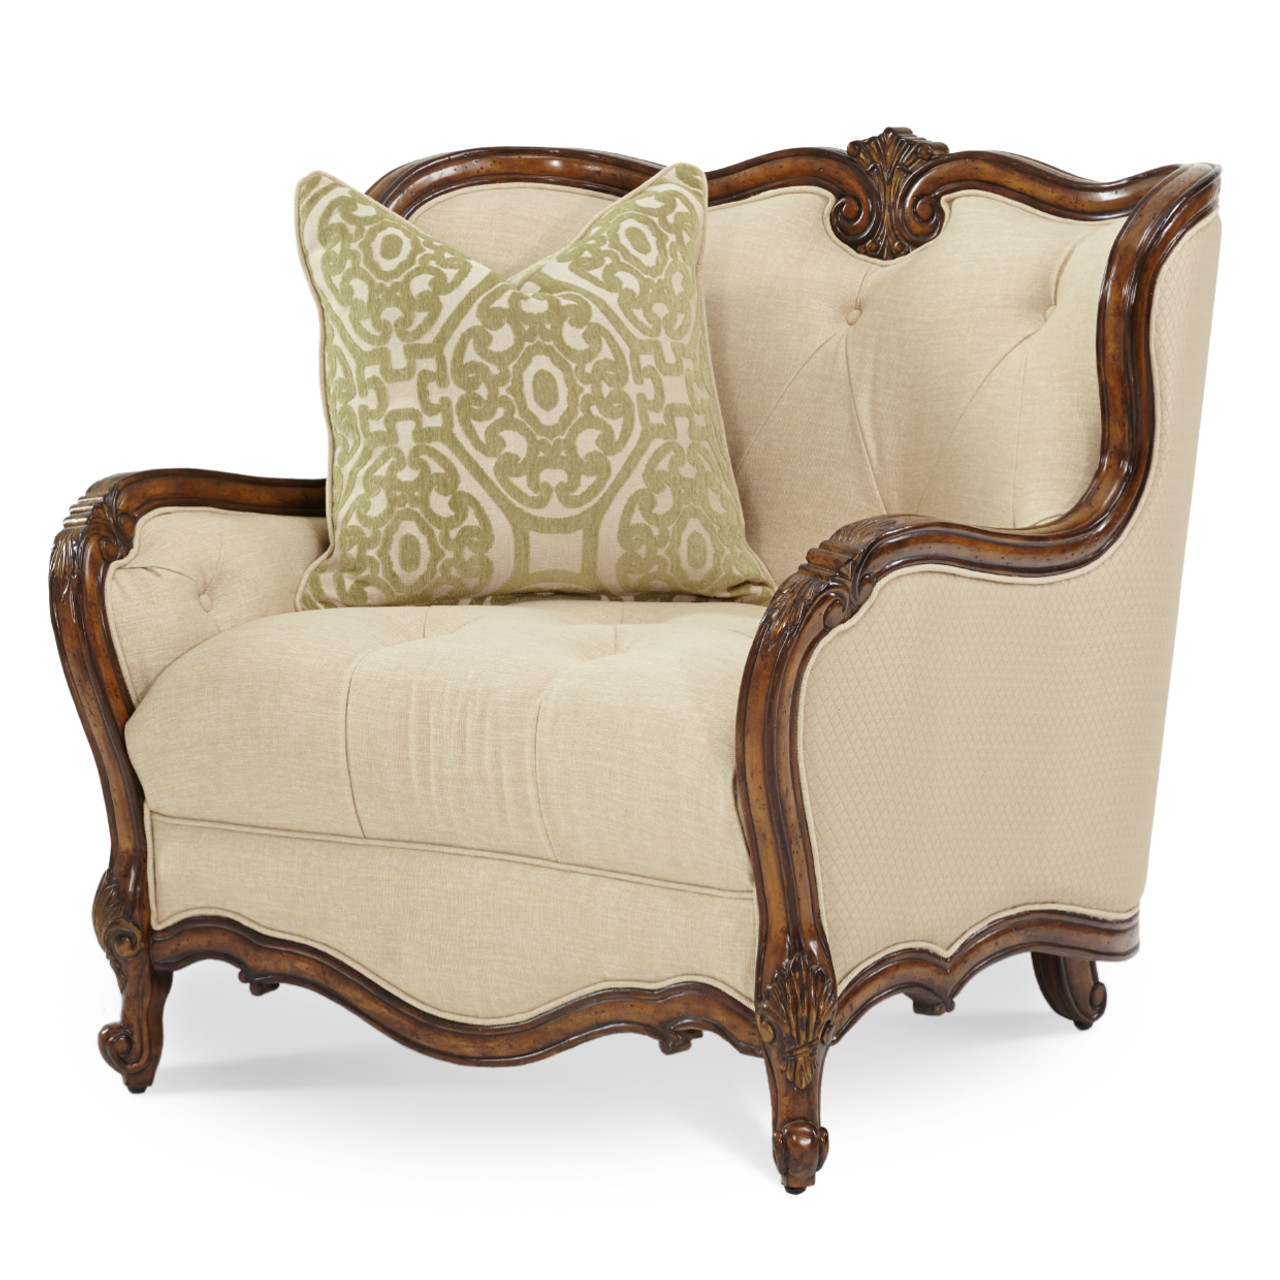 Caravelle Warm Walnut Fabric Chair And A Half Magnolia Hall